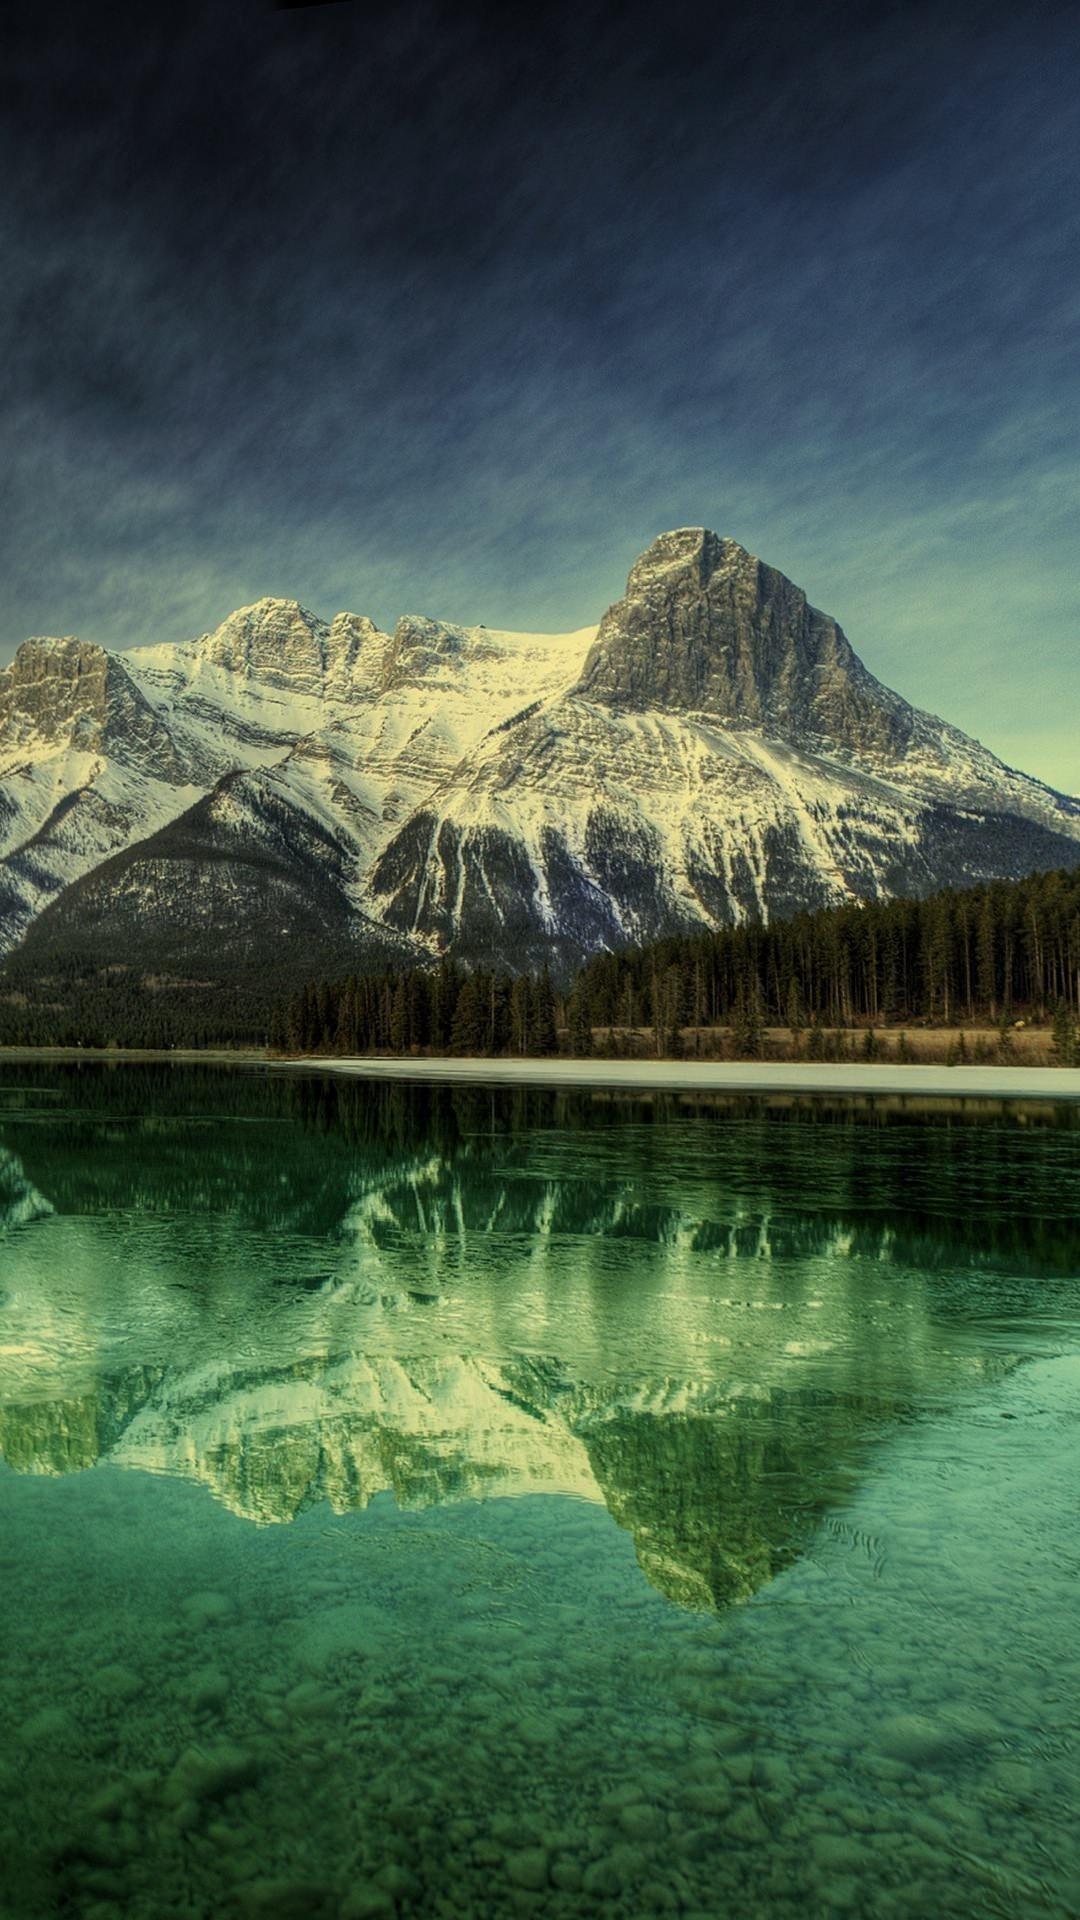 Landscape wallpaper